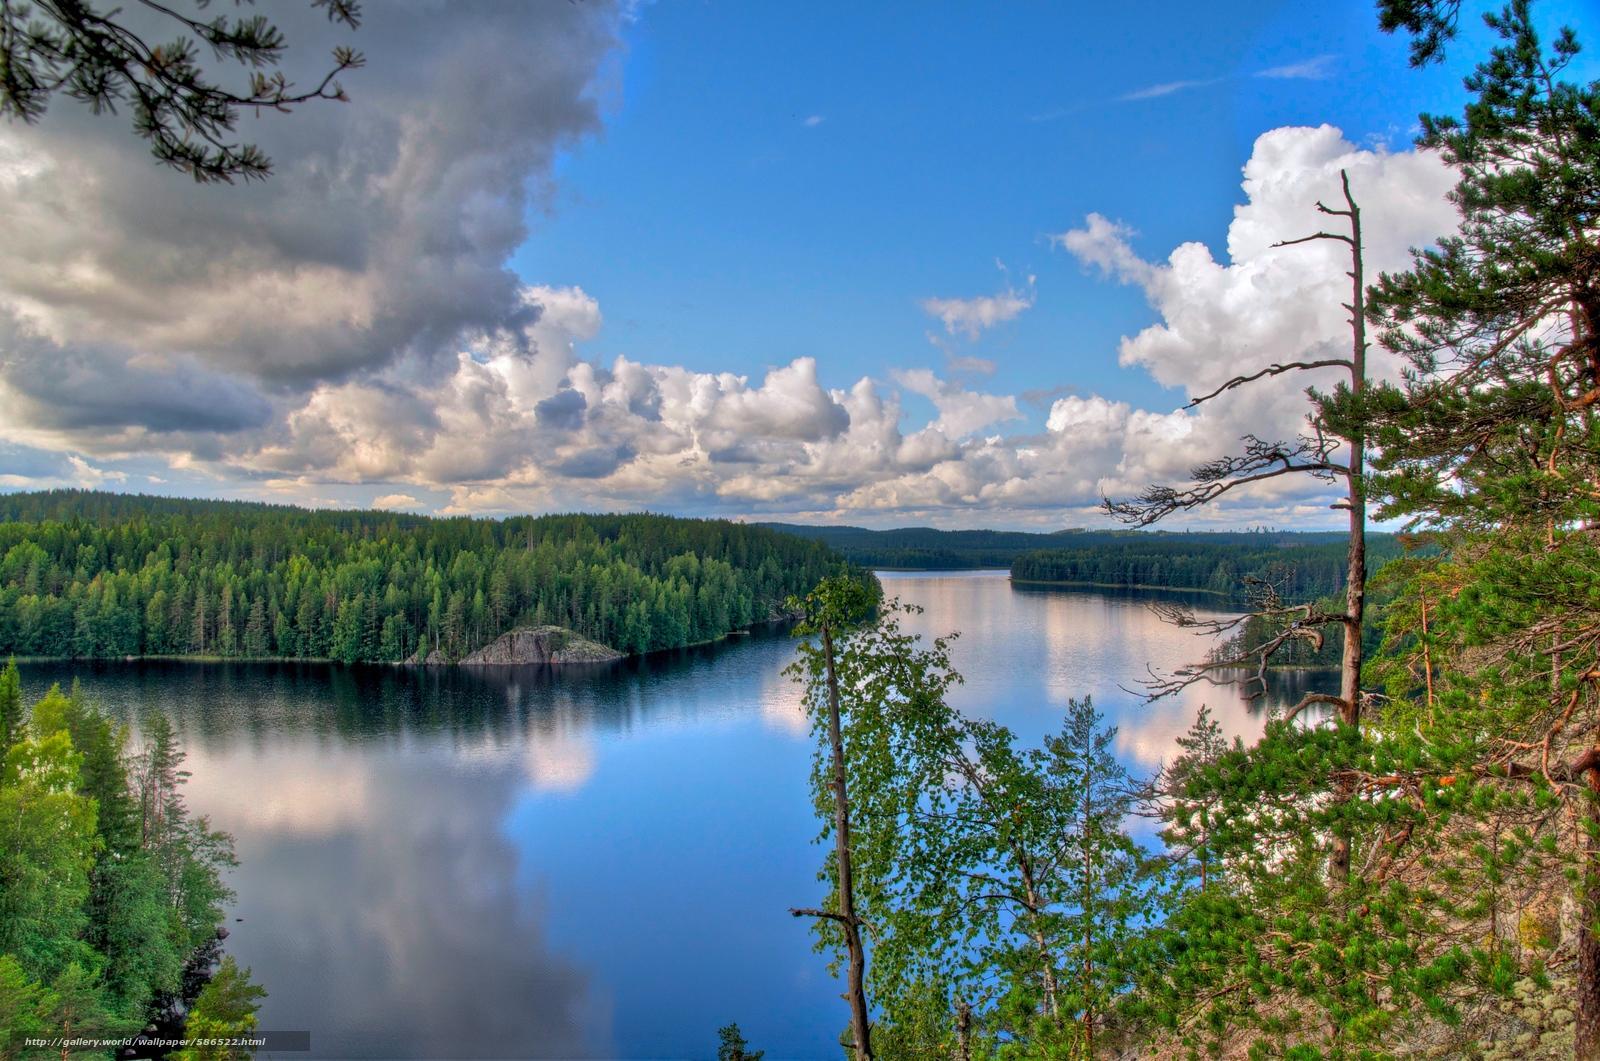 src=http___st.gdefon.com_wallpapers_original_wallpapers_586522_lake-view_finland_reka_les_derevya_nebo_peyzaj_4286x2843_(www.GdeFon.ru).jpg&refer=http___st.gdefon.jpg